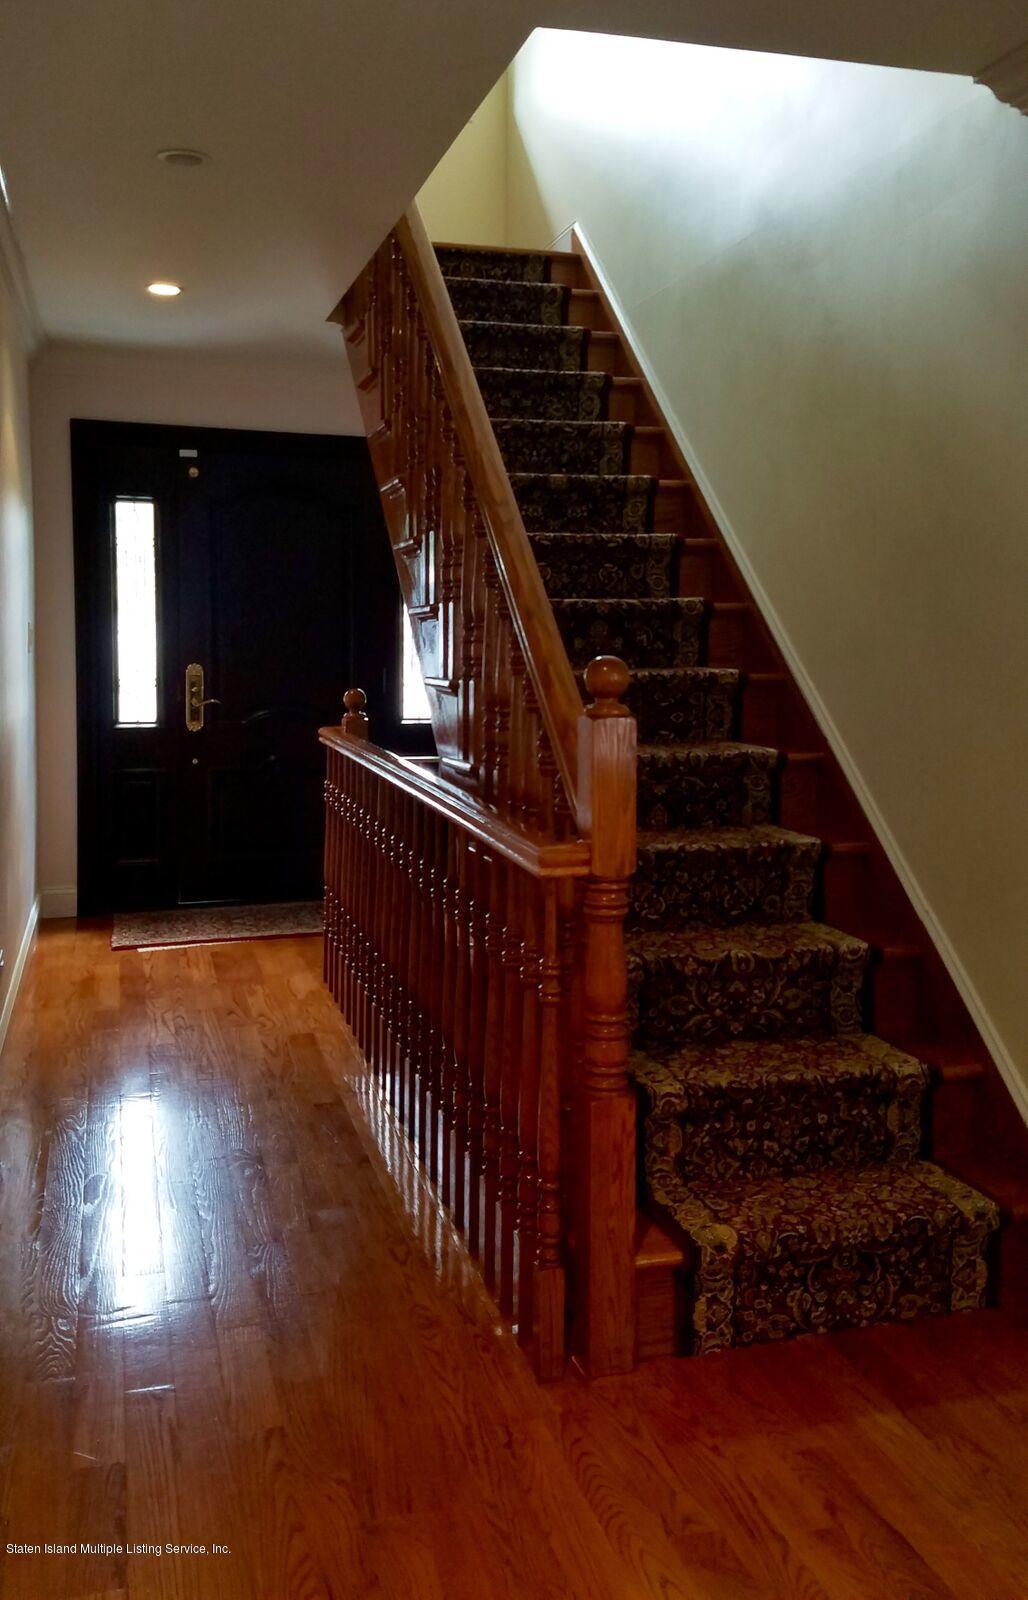 Single Family - Detached 104 Dutchess Ave   Staten Island, NY 10304, MLS-1113043-6